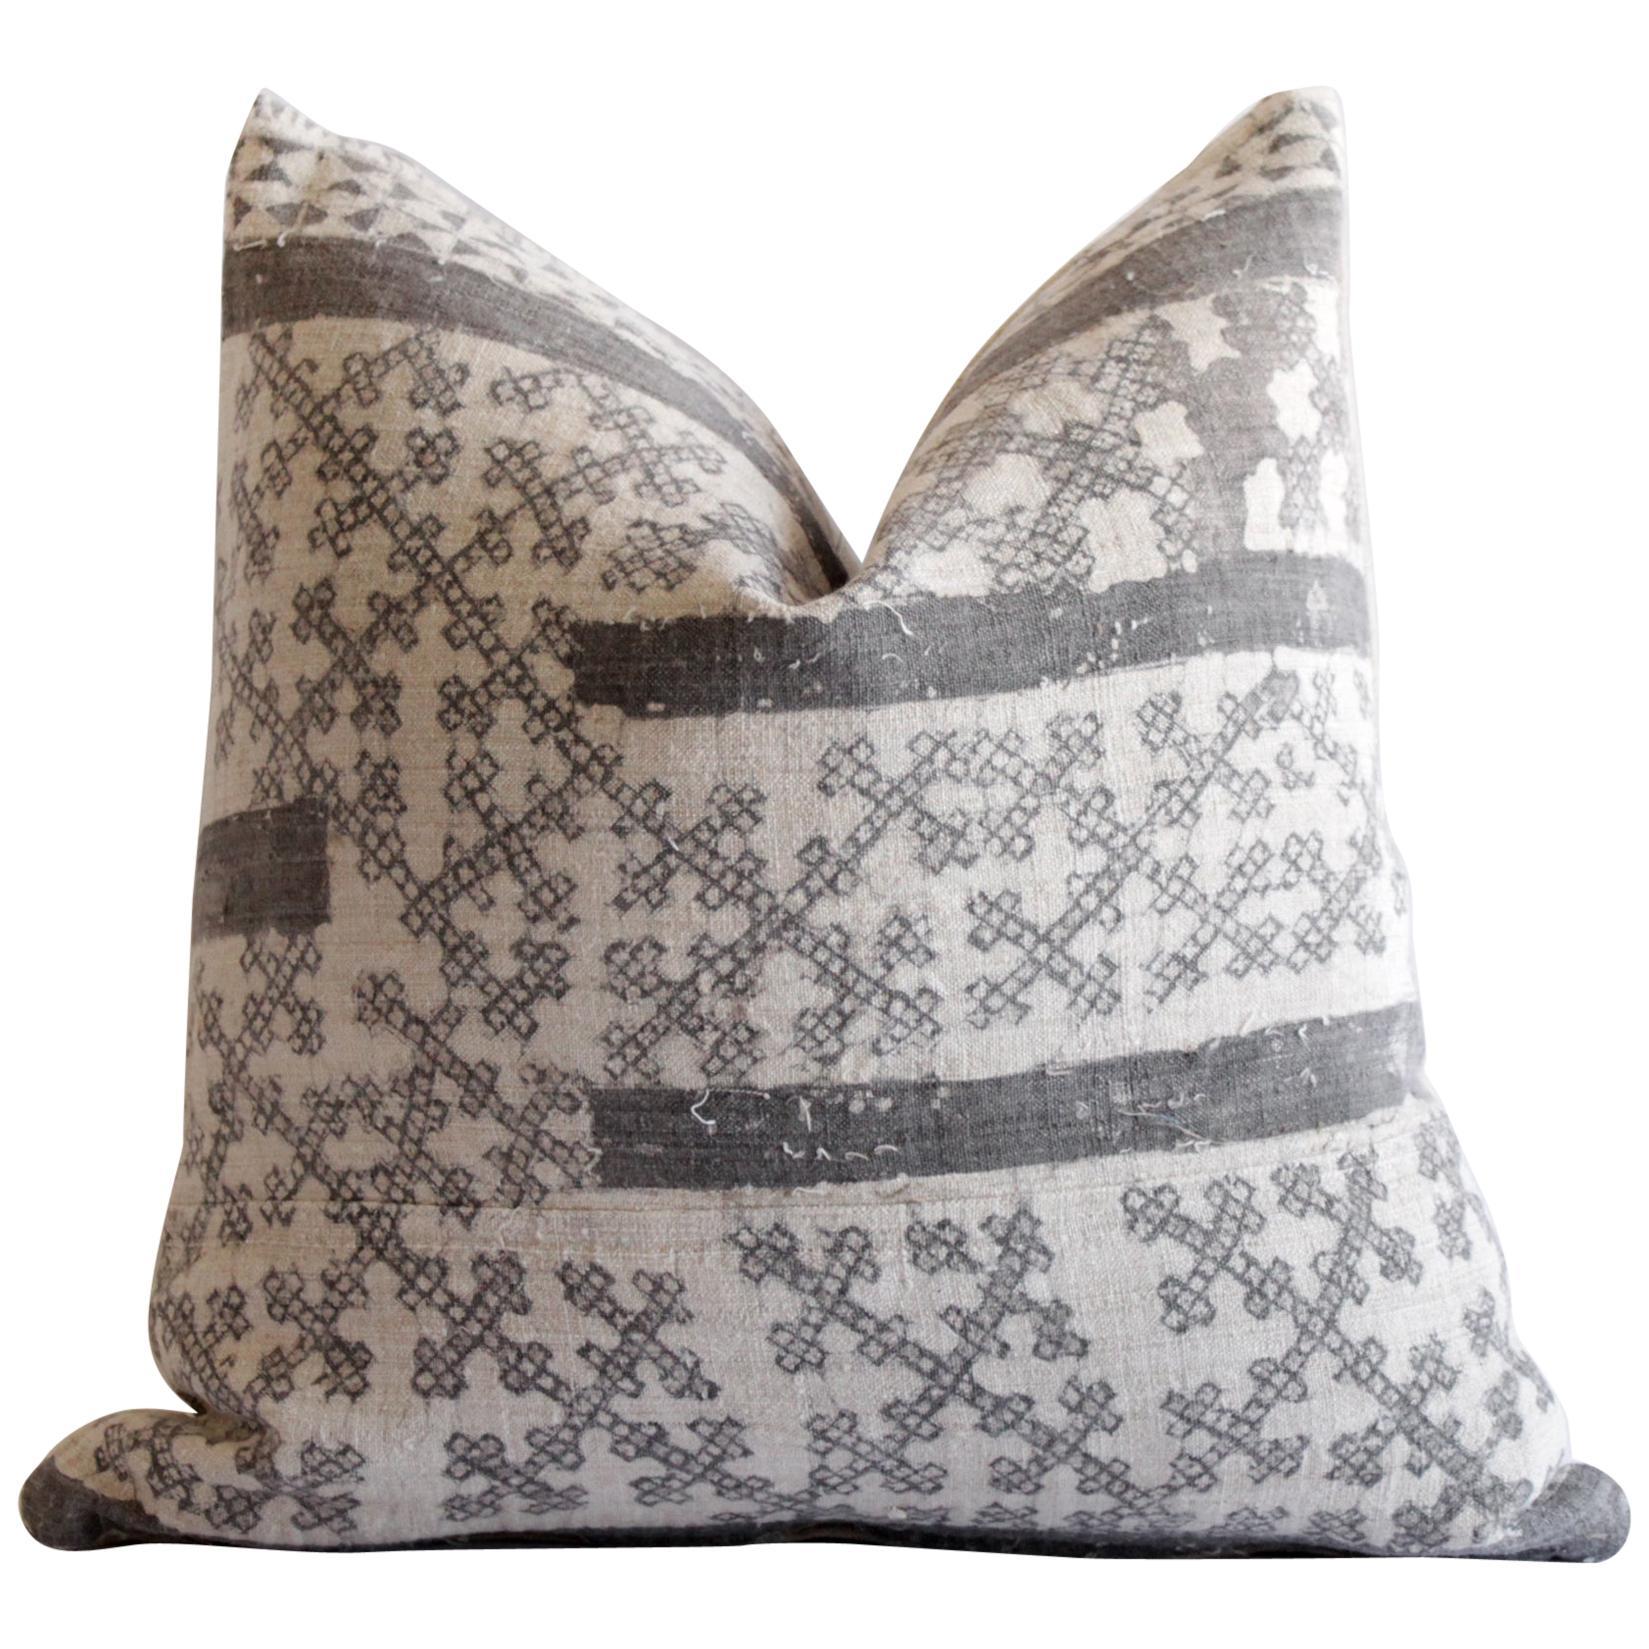 Vintage Batik Accent Pillow Charcoal and Natural Linen